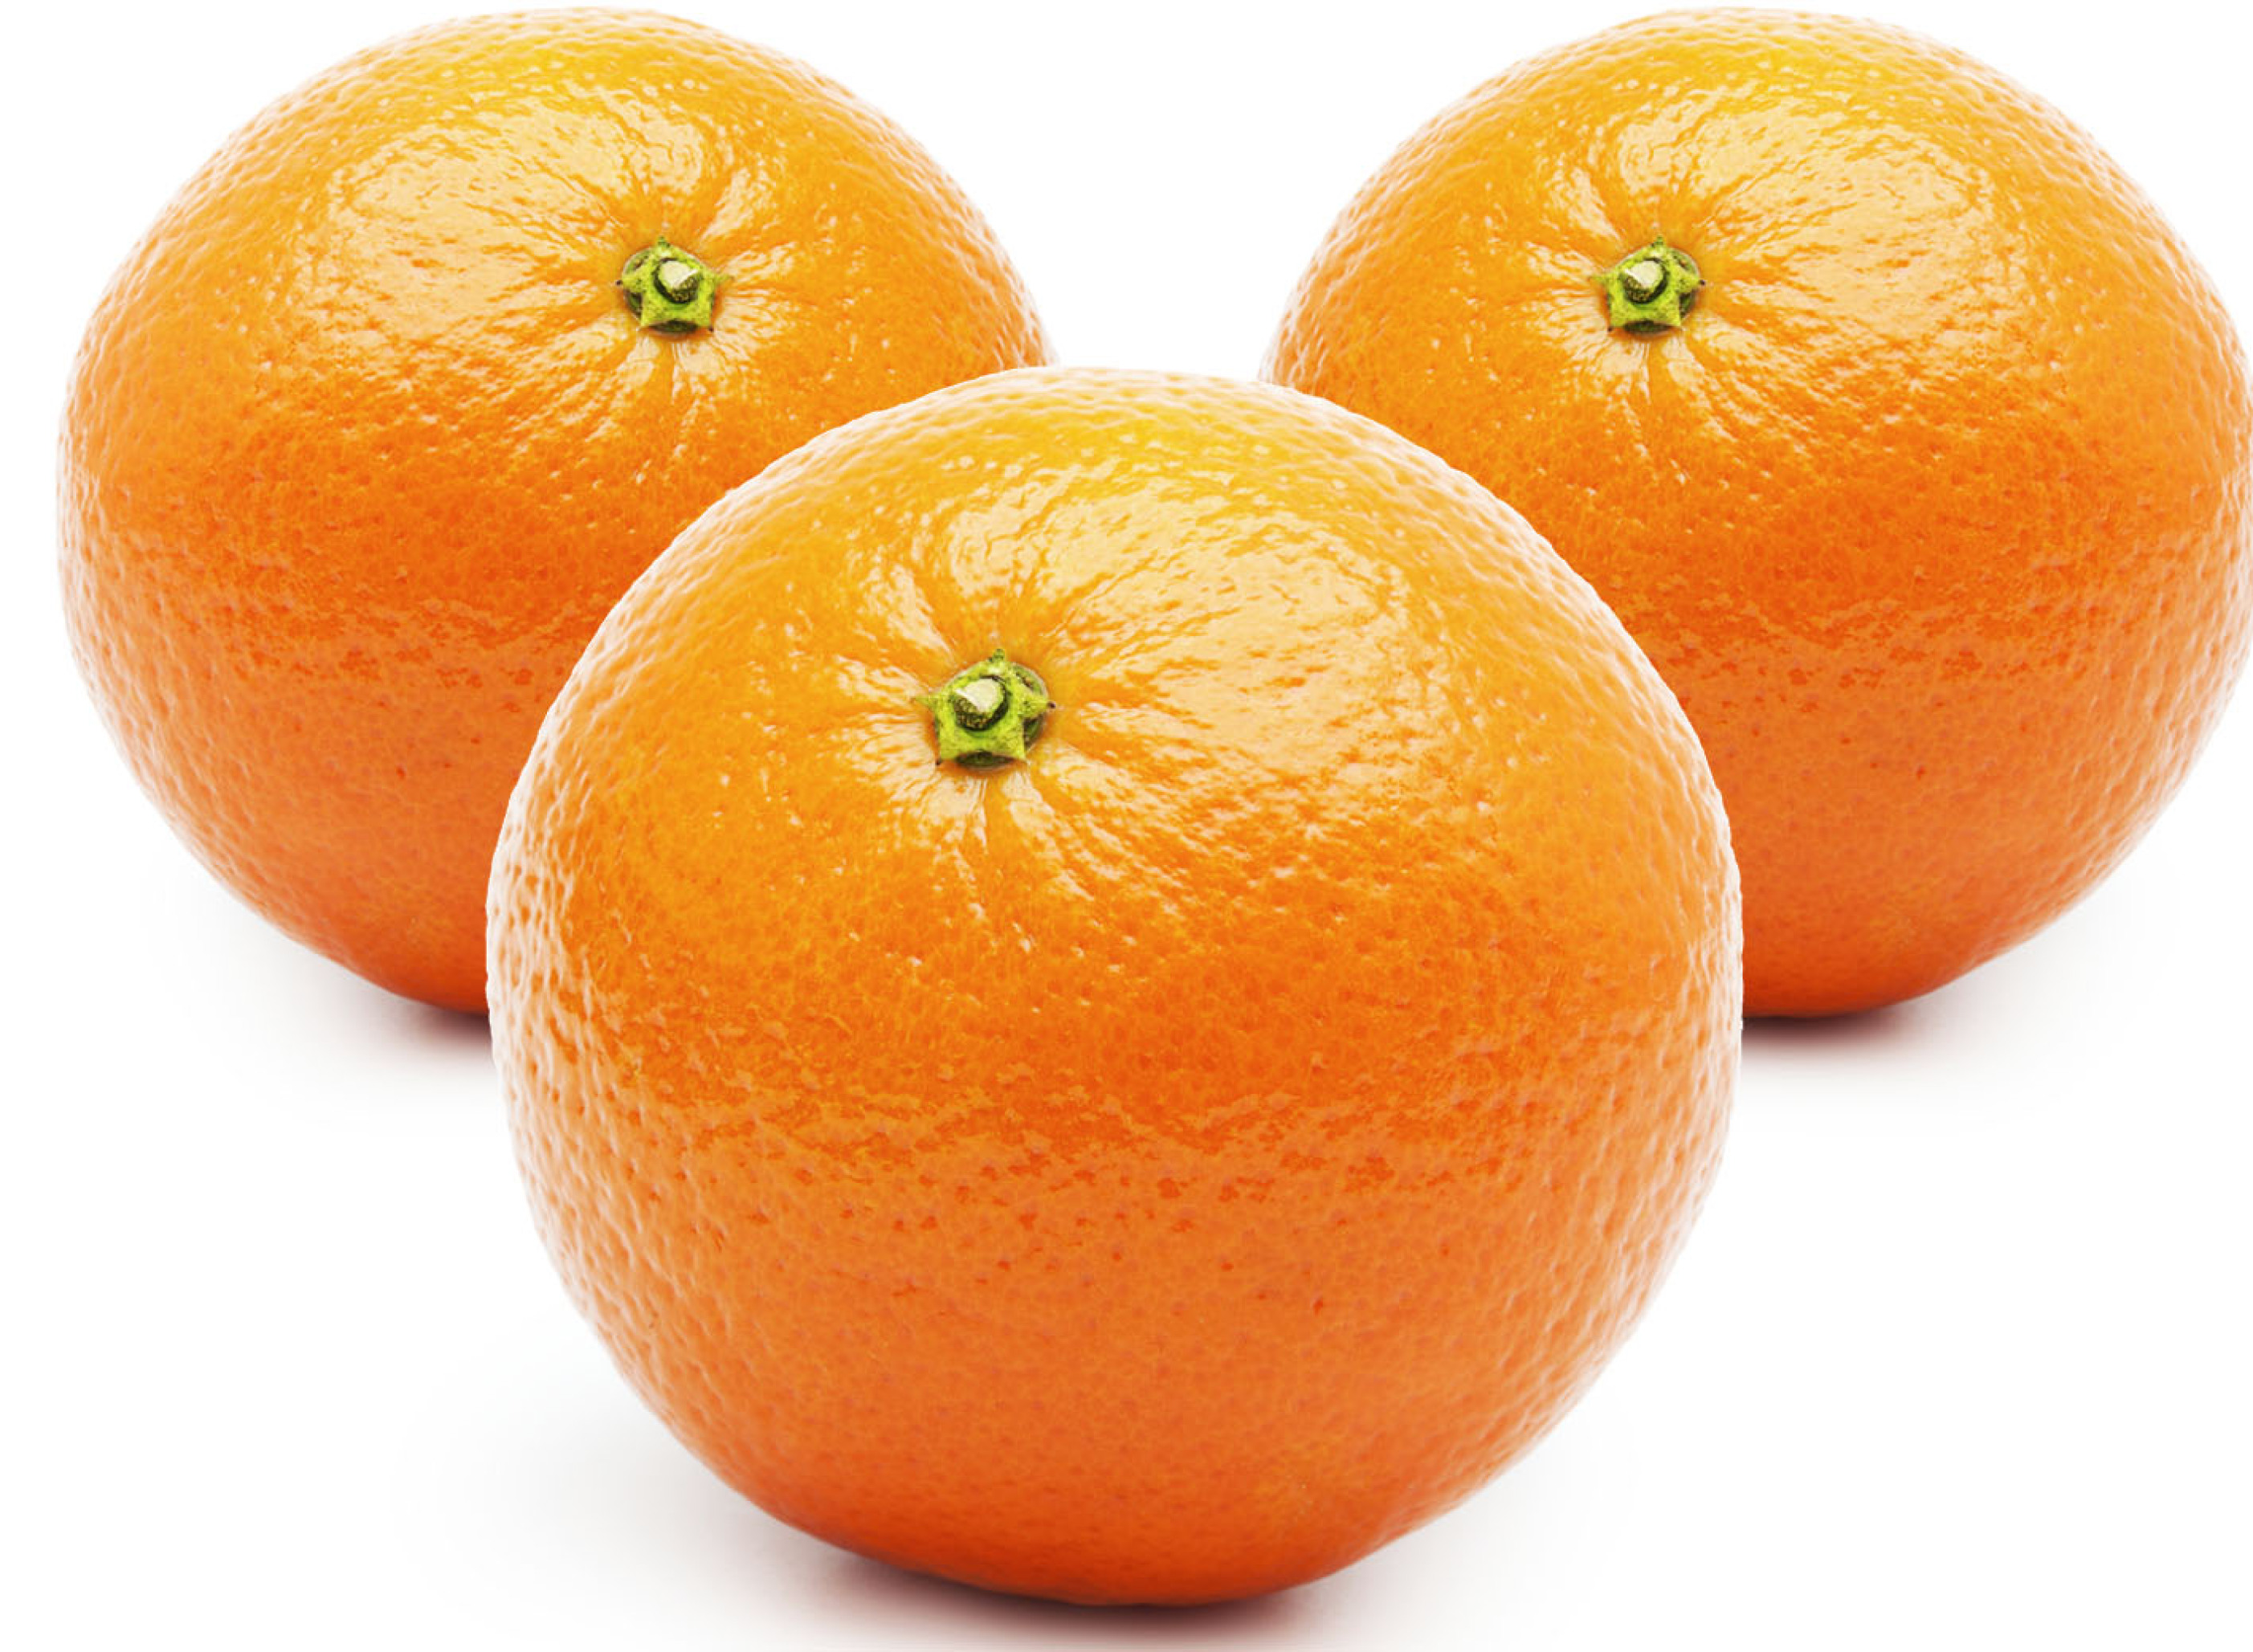 پرتقال تامسون یک کیلویی ایران زمین - پرتقال تامسون یک کیلویی ایران زمین